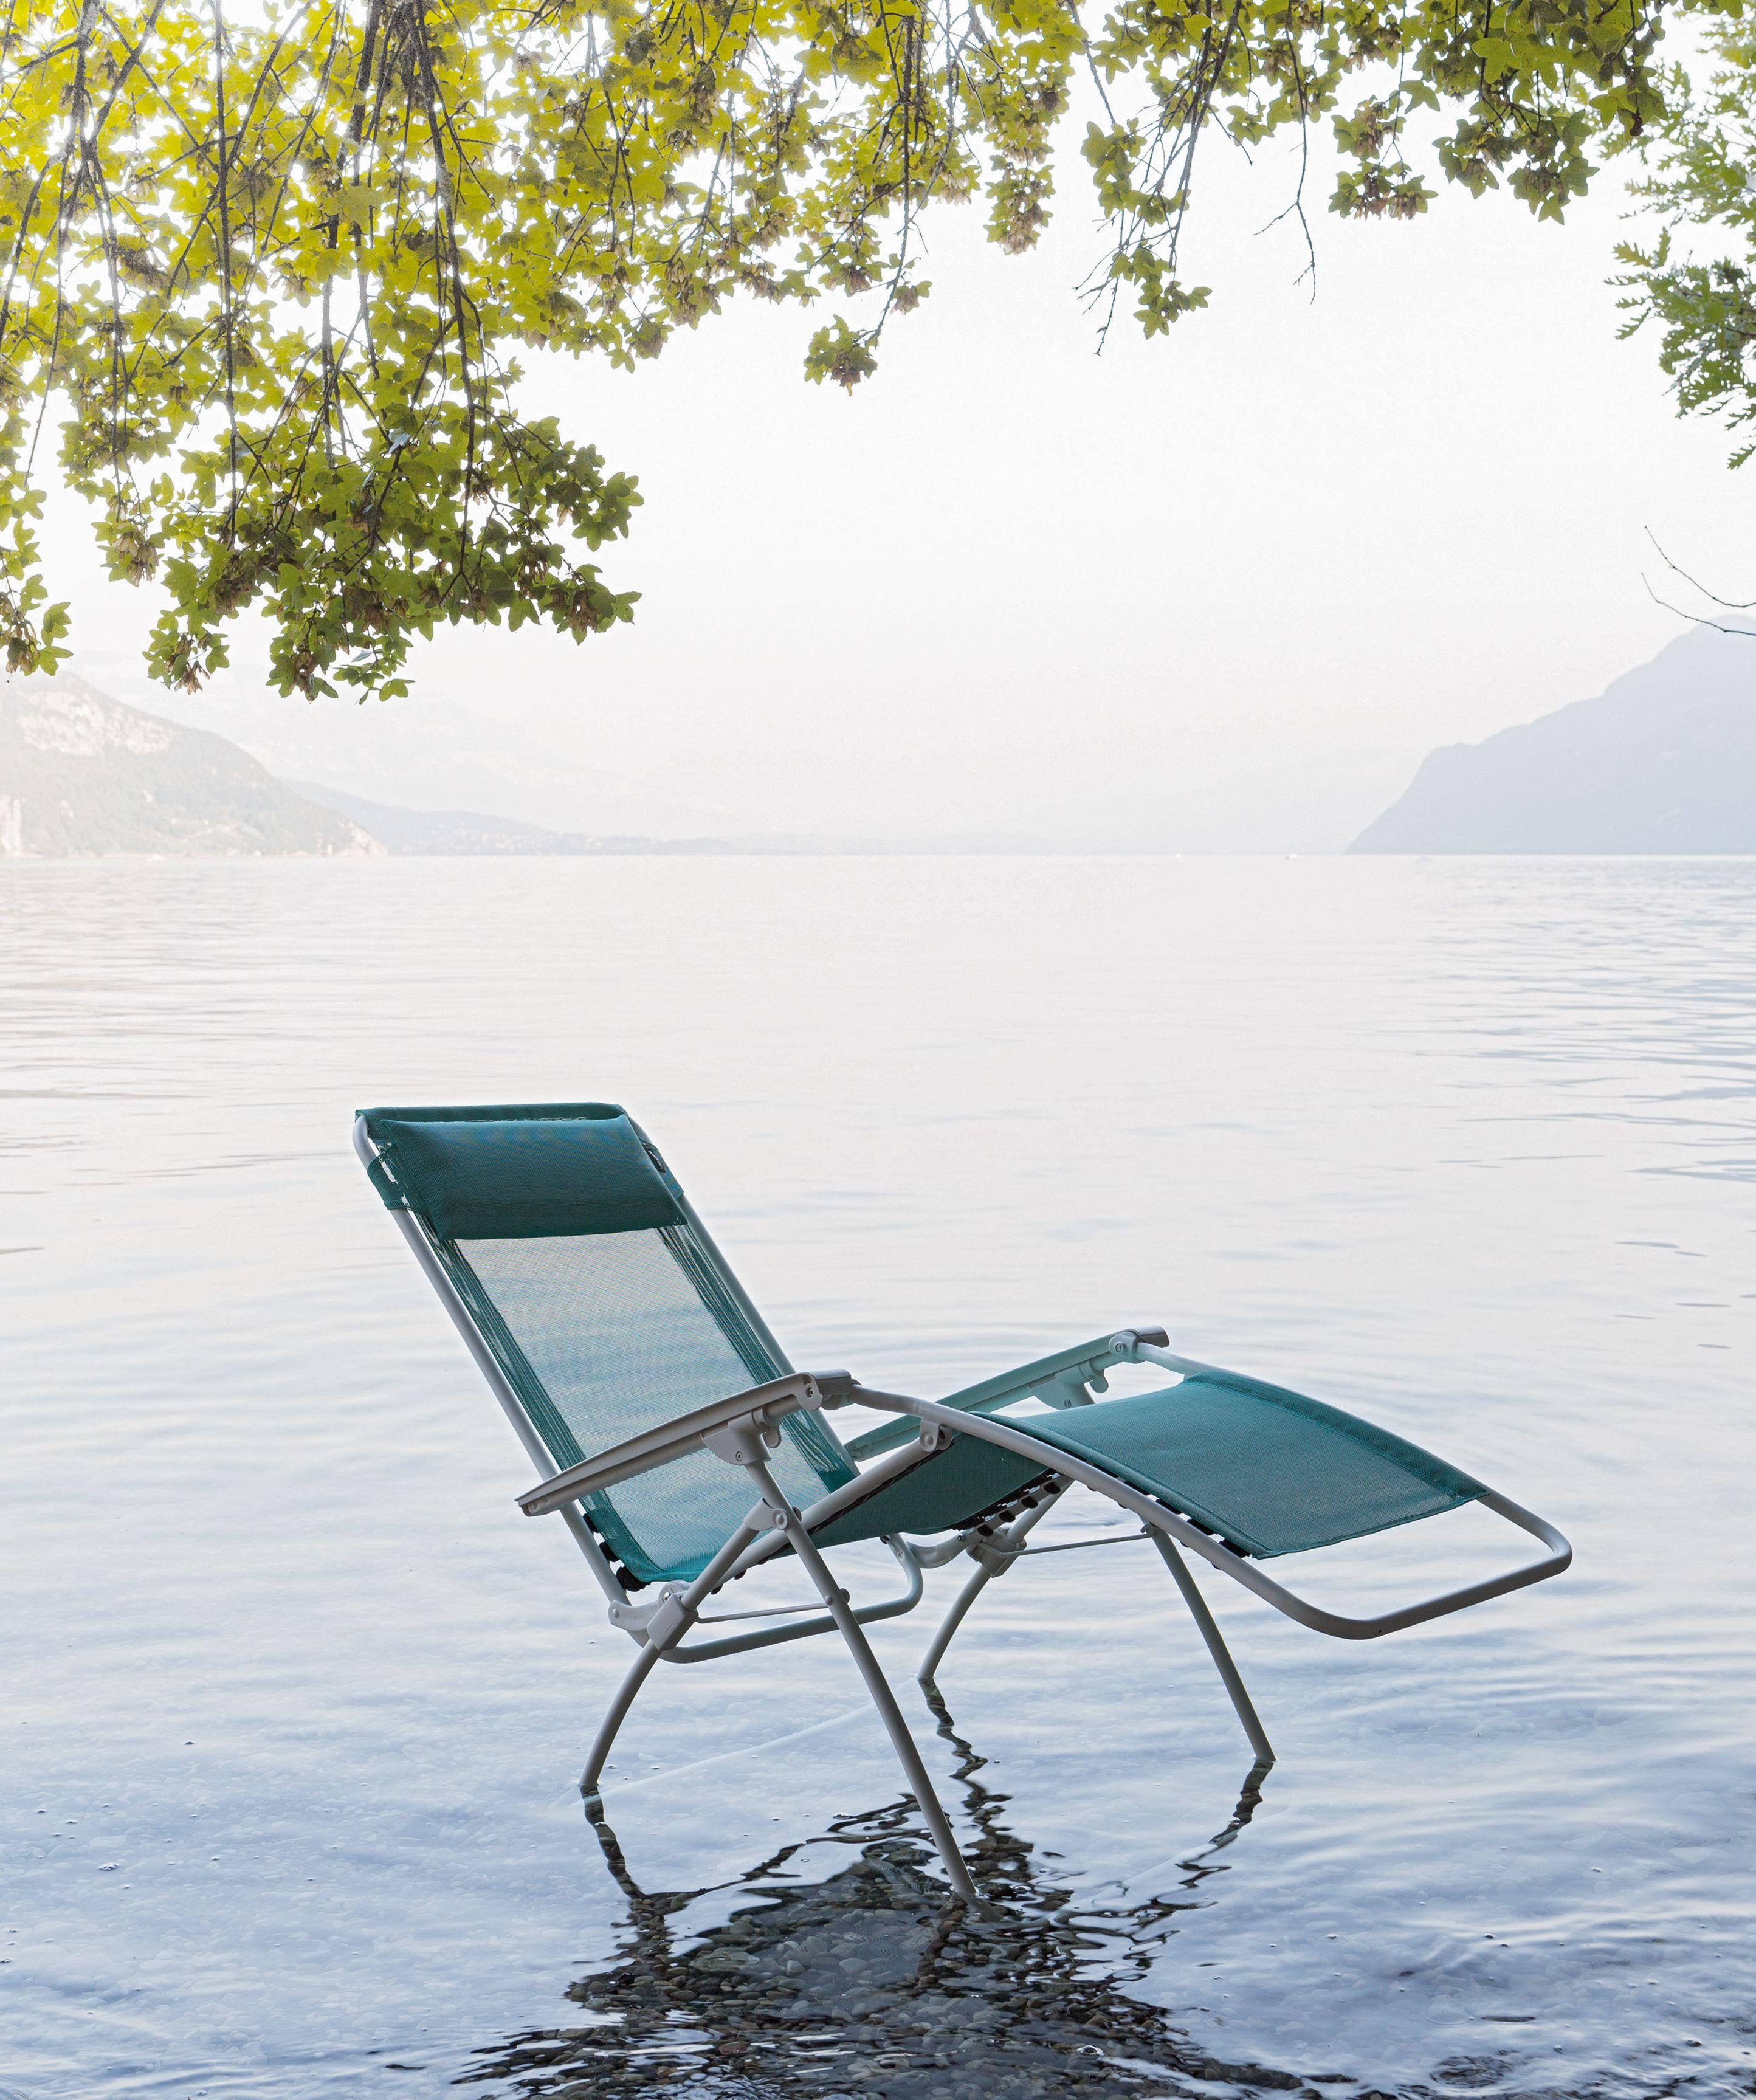 fauteuil relax r clip ciel lafuma mobilier pierrick verny relaxation pinterest. Black Bedroom Furniture Sets. Home Design Ideas